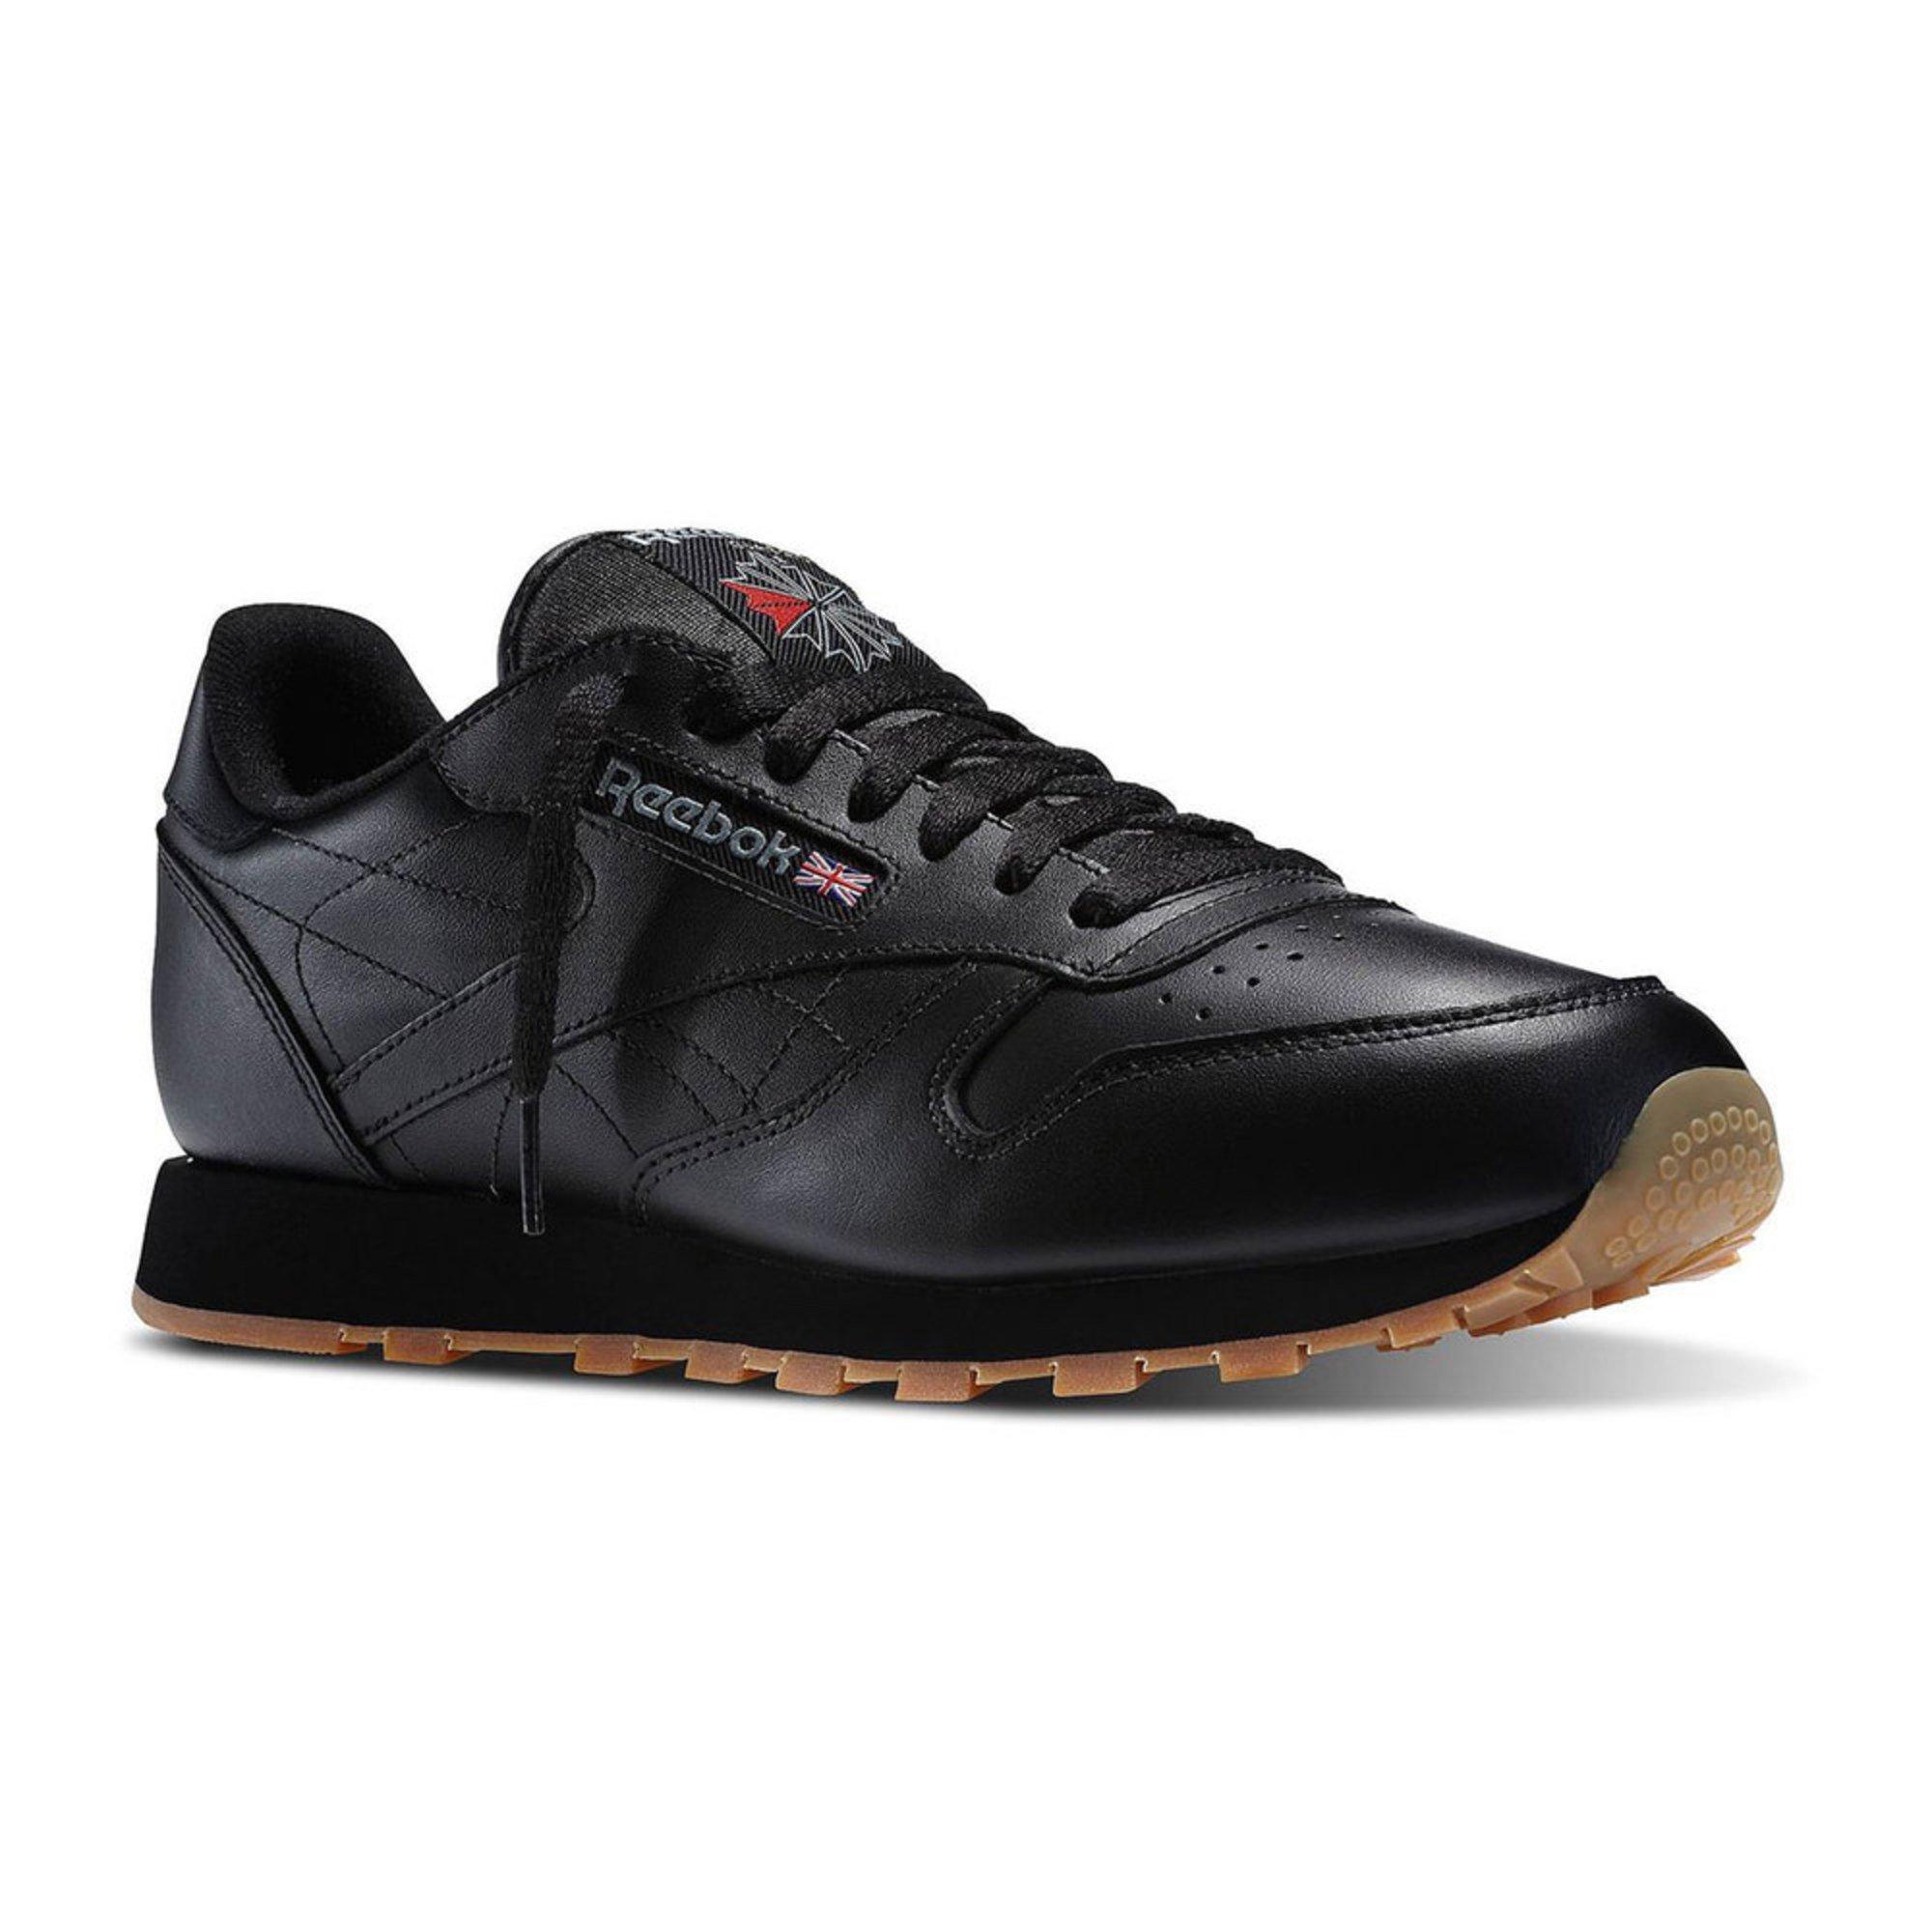 48ec38568ec01 Reebok Men s Classic Leather Running Shoe